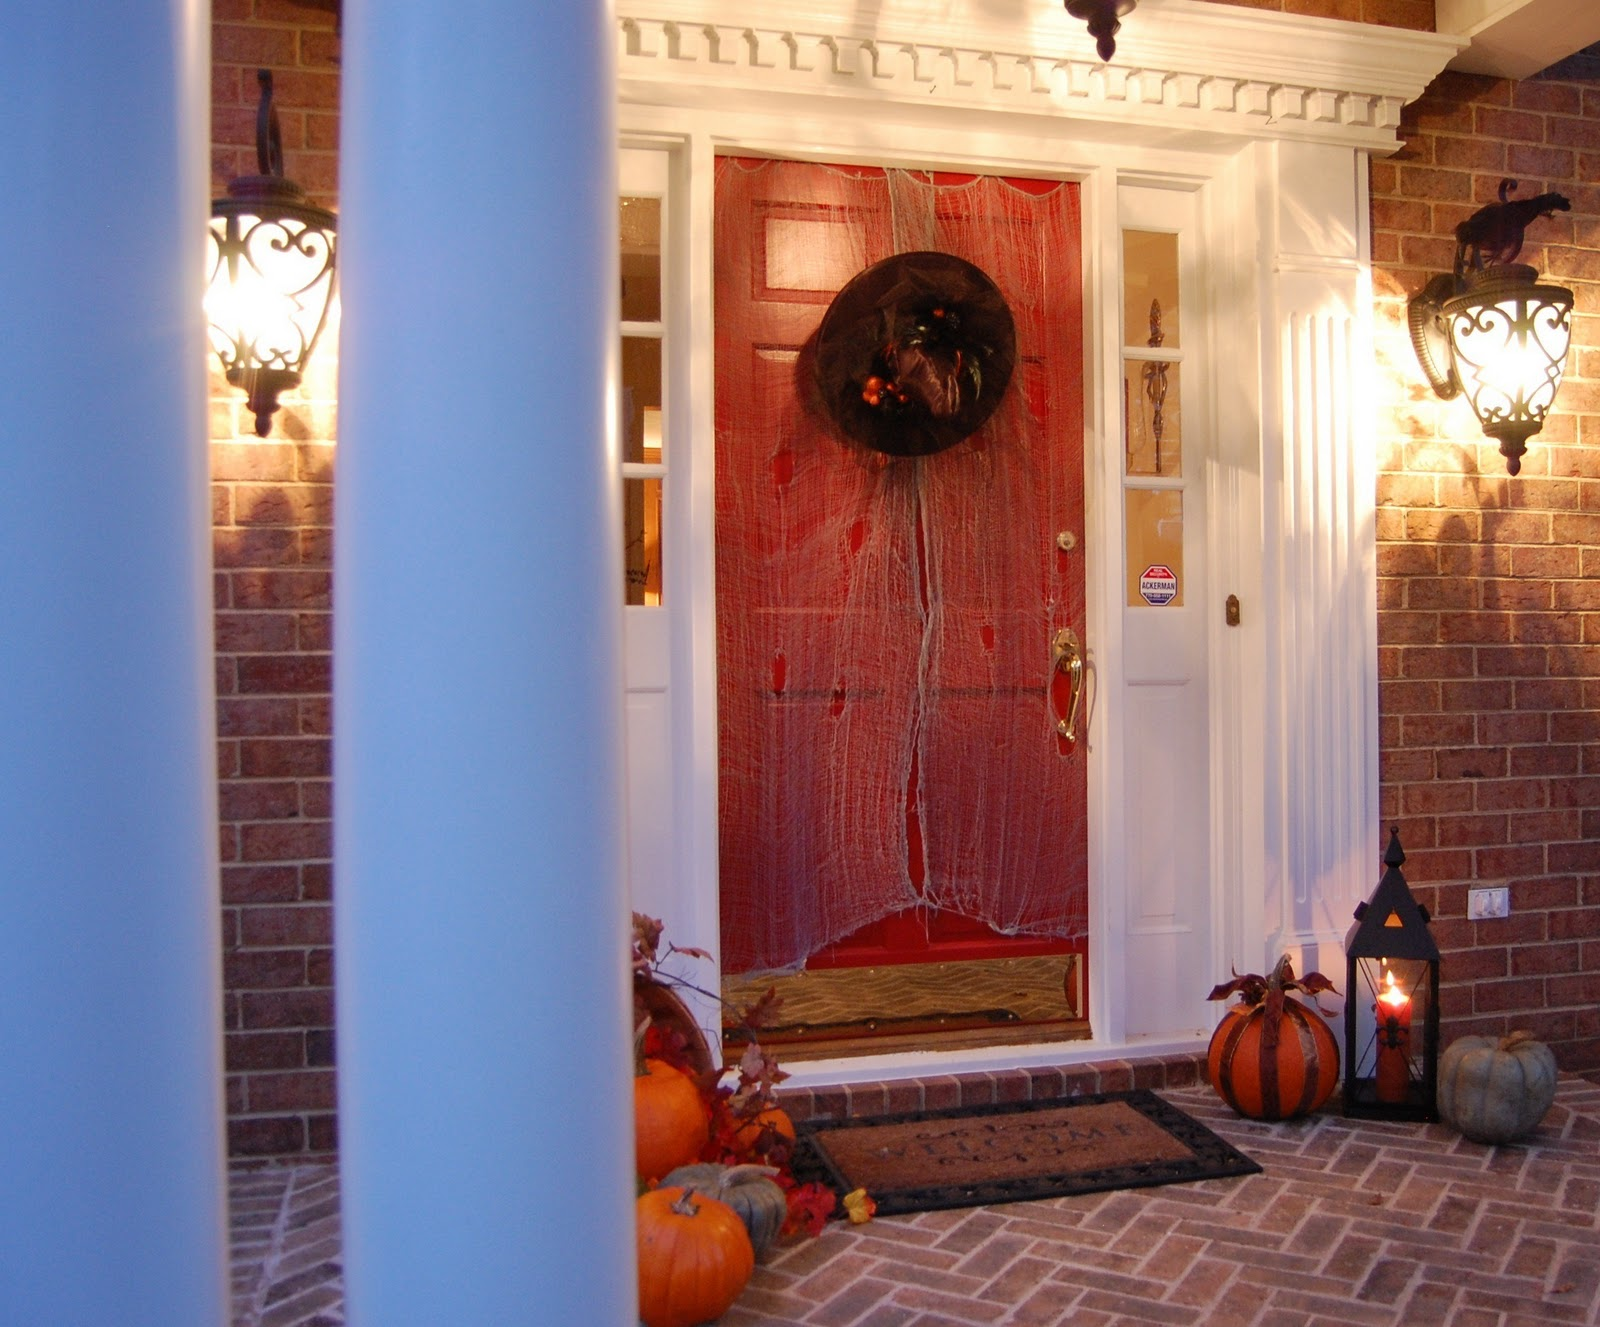 Halloween front porch decorations - Halloween Front Porch Decorations